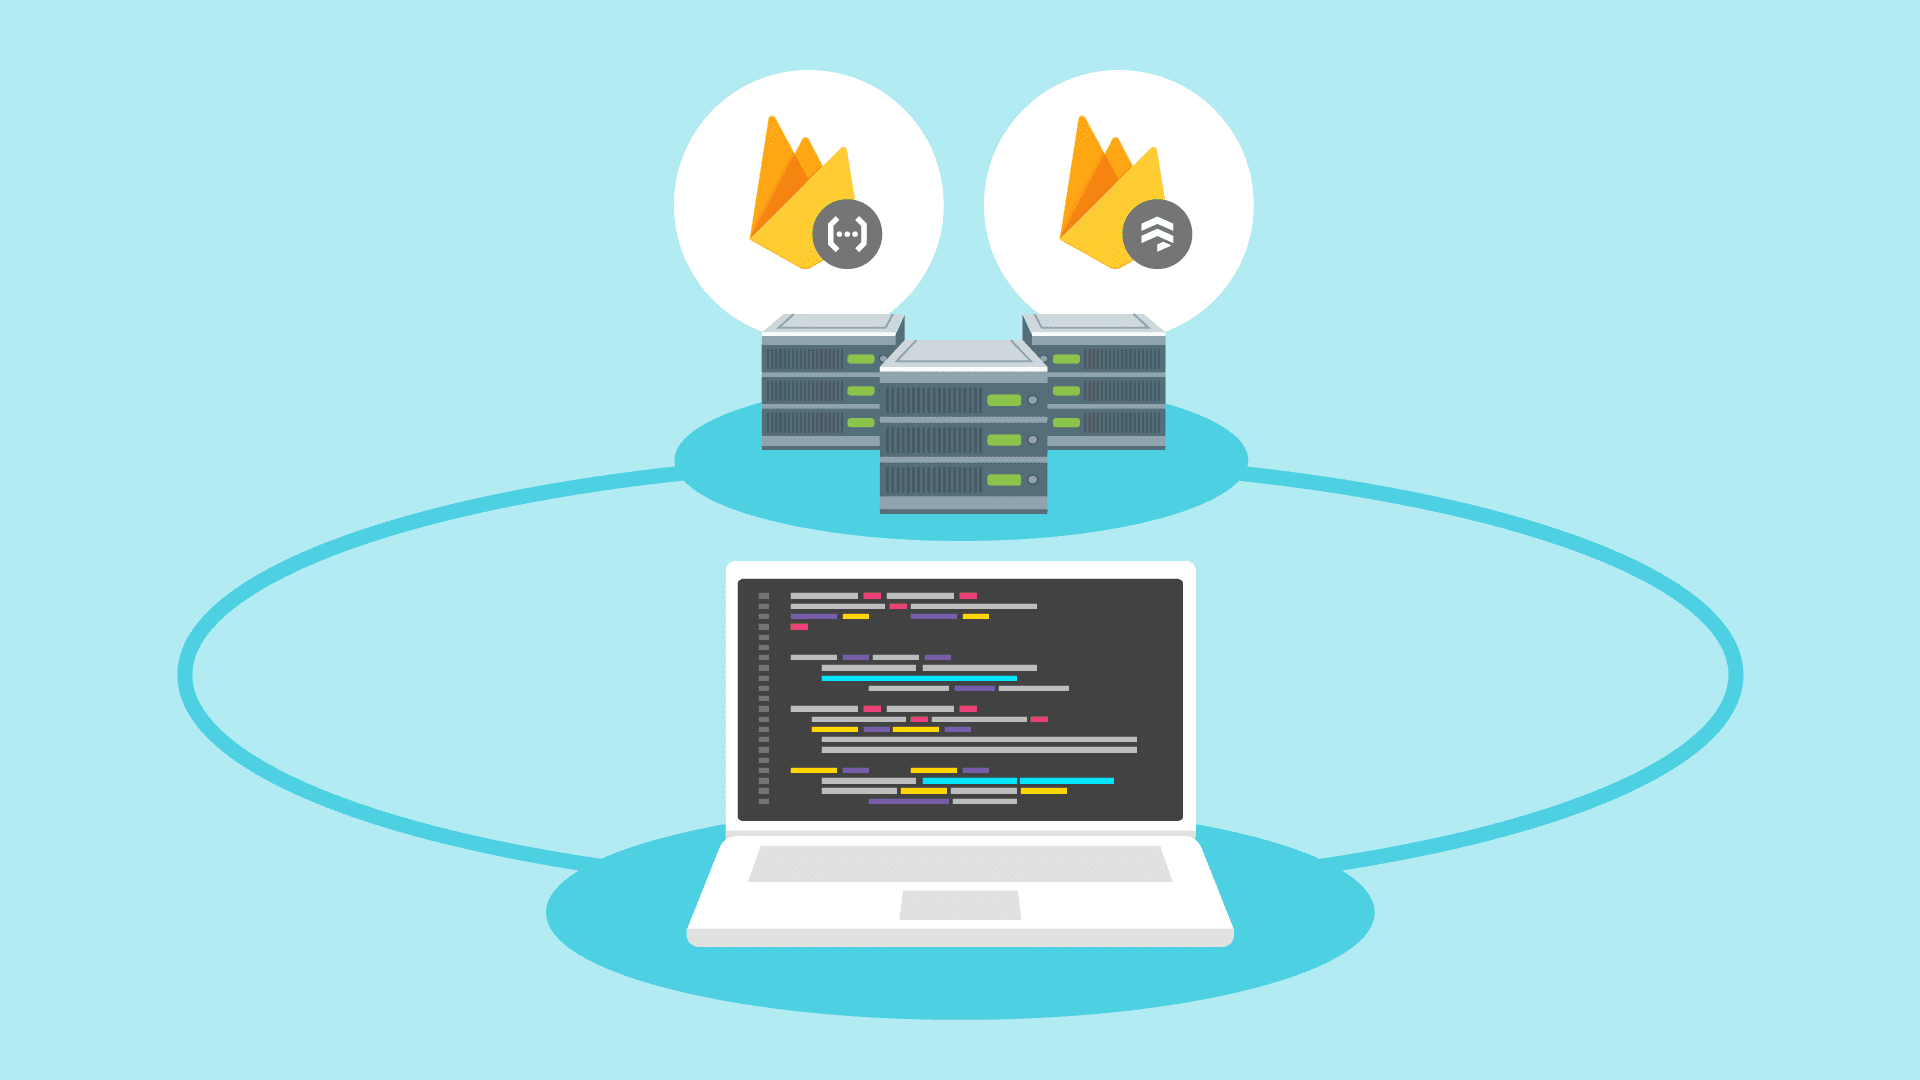 Illustration des Laptops mit Servern dahinter